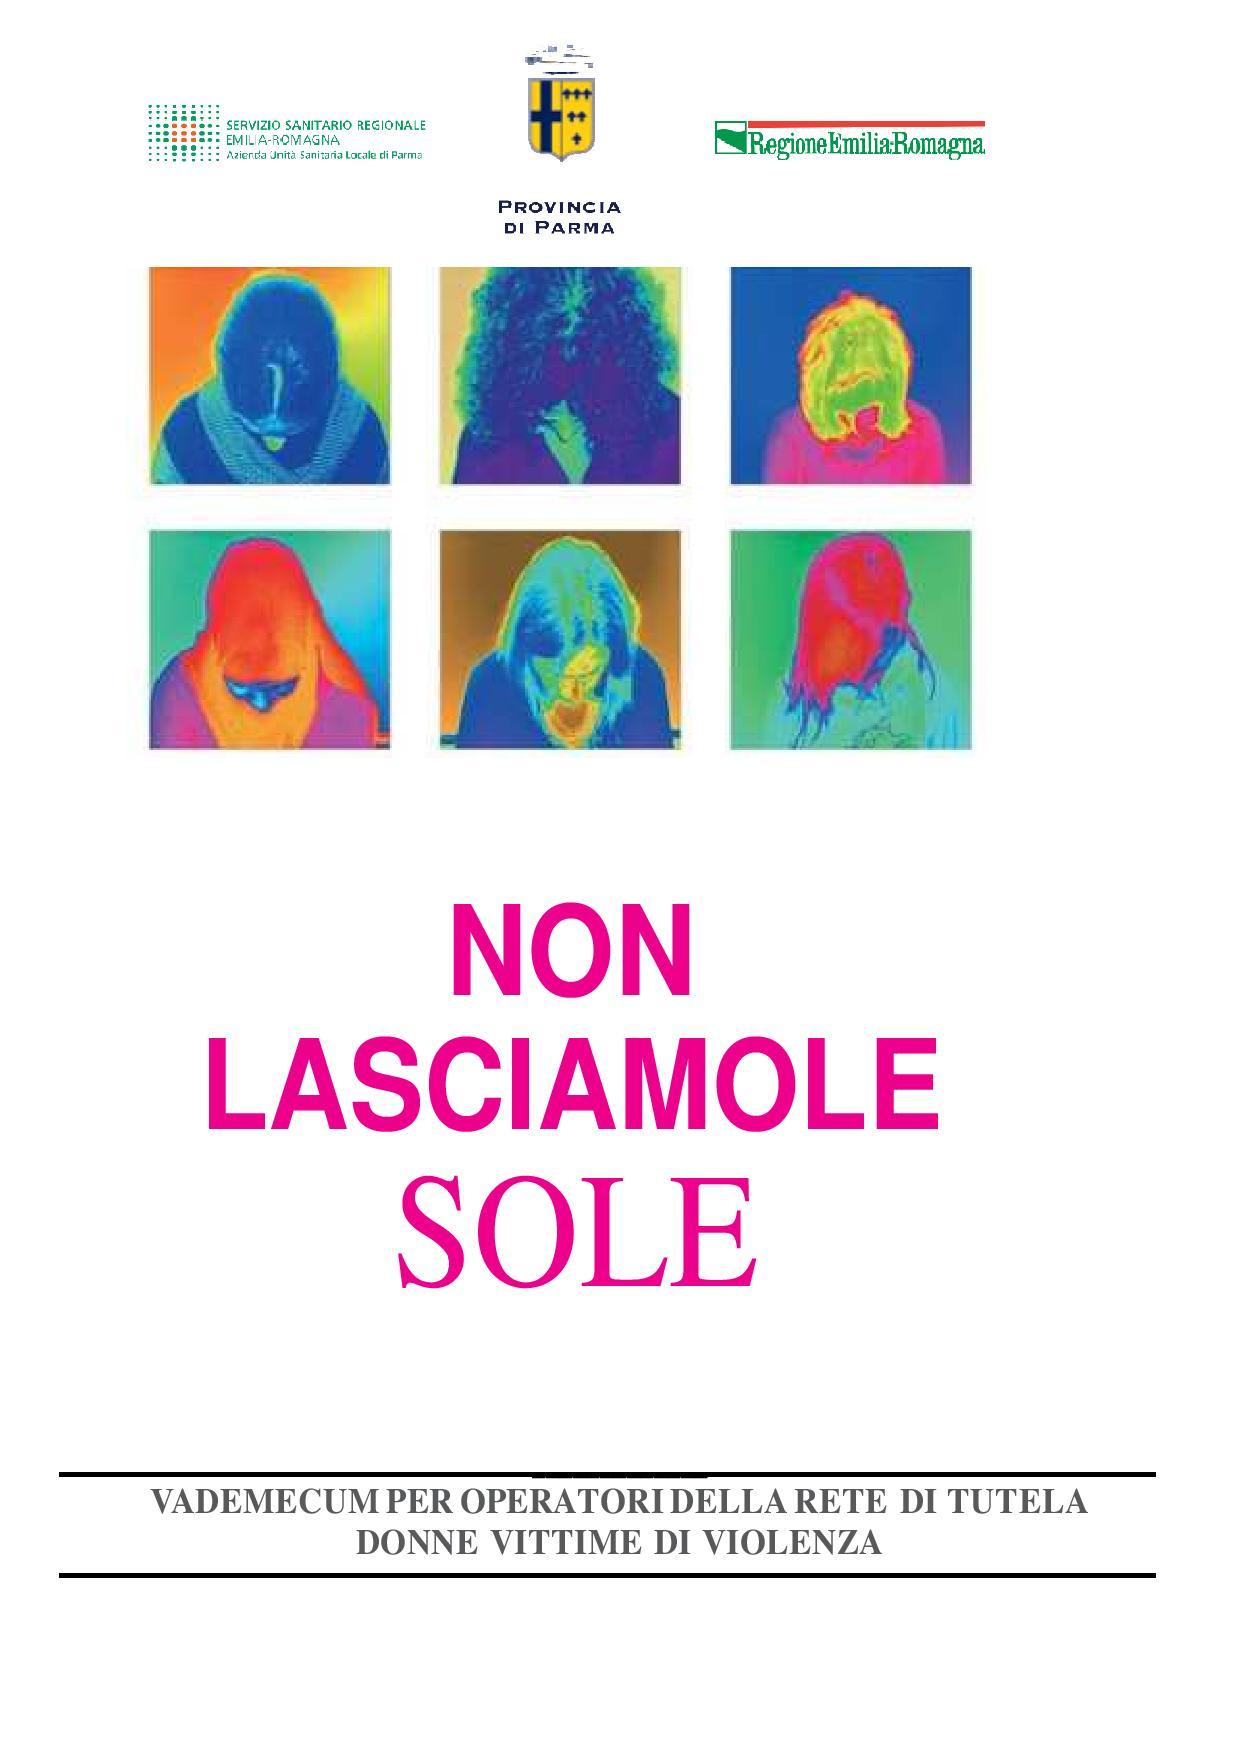 copertina vademecum-page-001